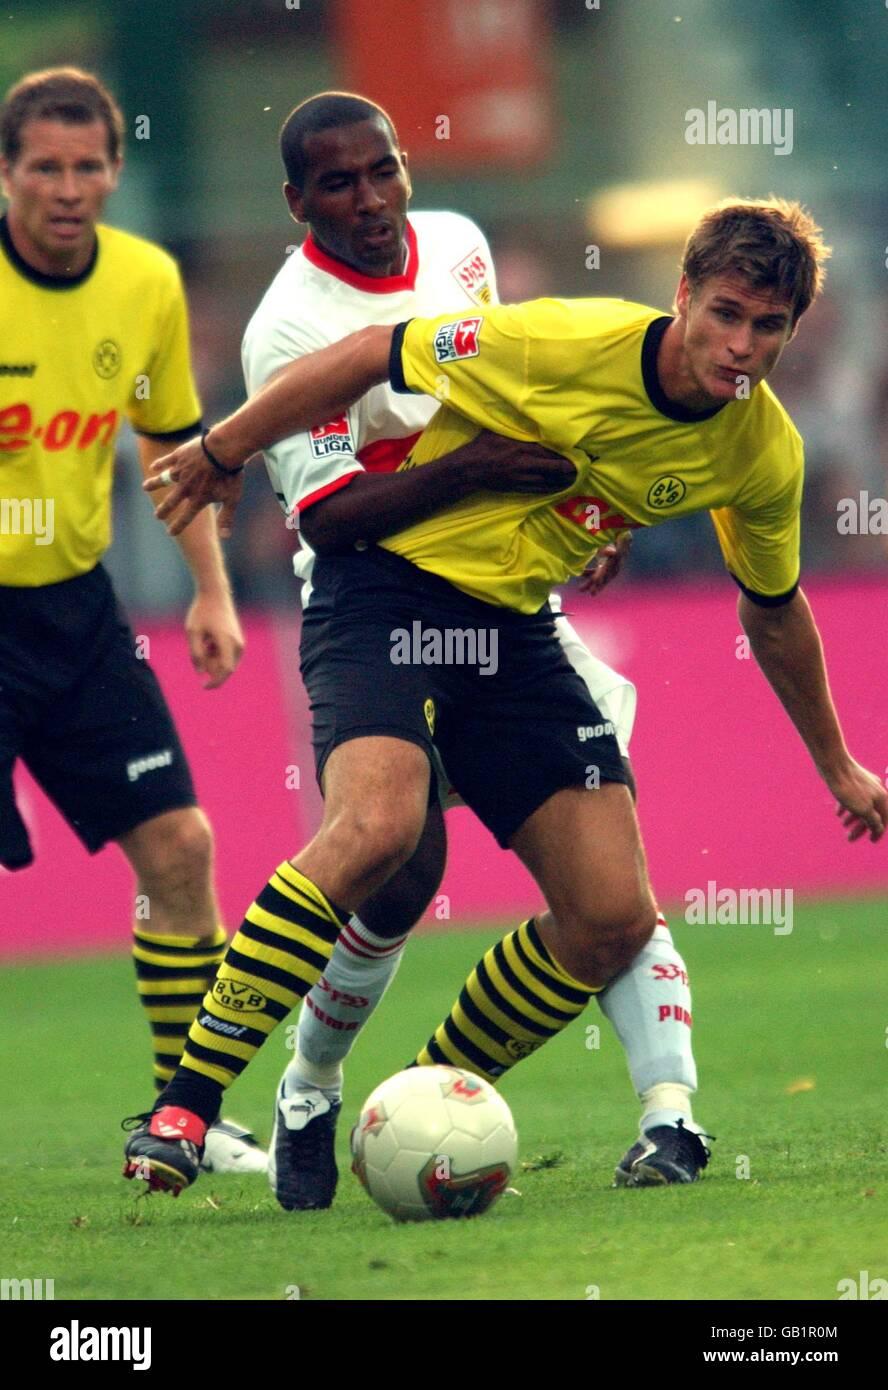 Soccer - Liga-Pokal Cup - Borussia Dortmund v VFB Stuttgart - Stock Image